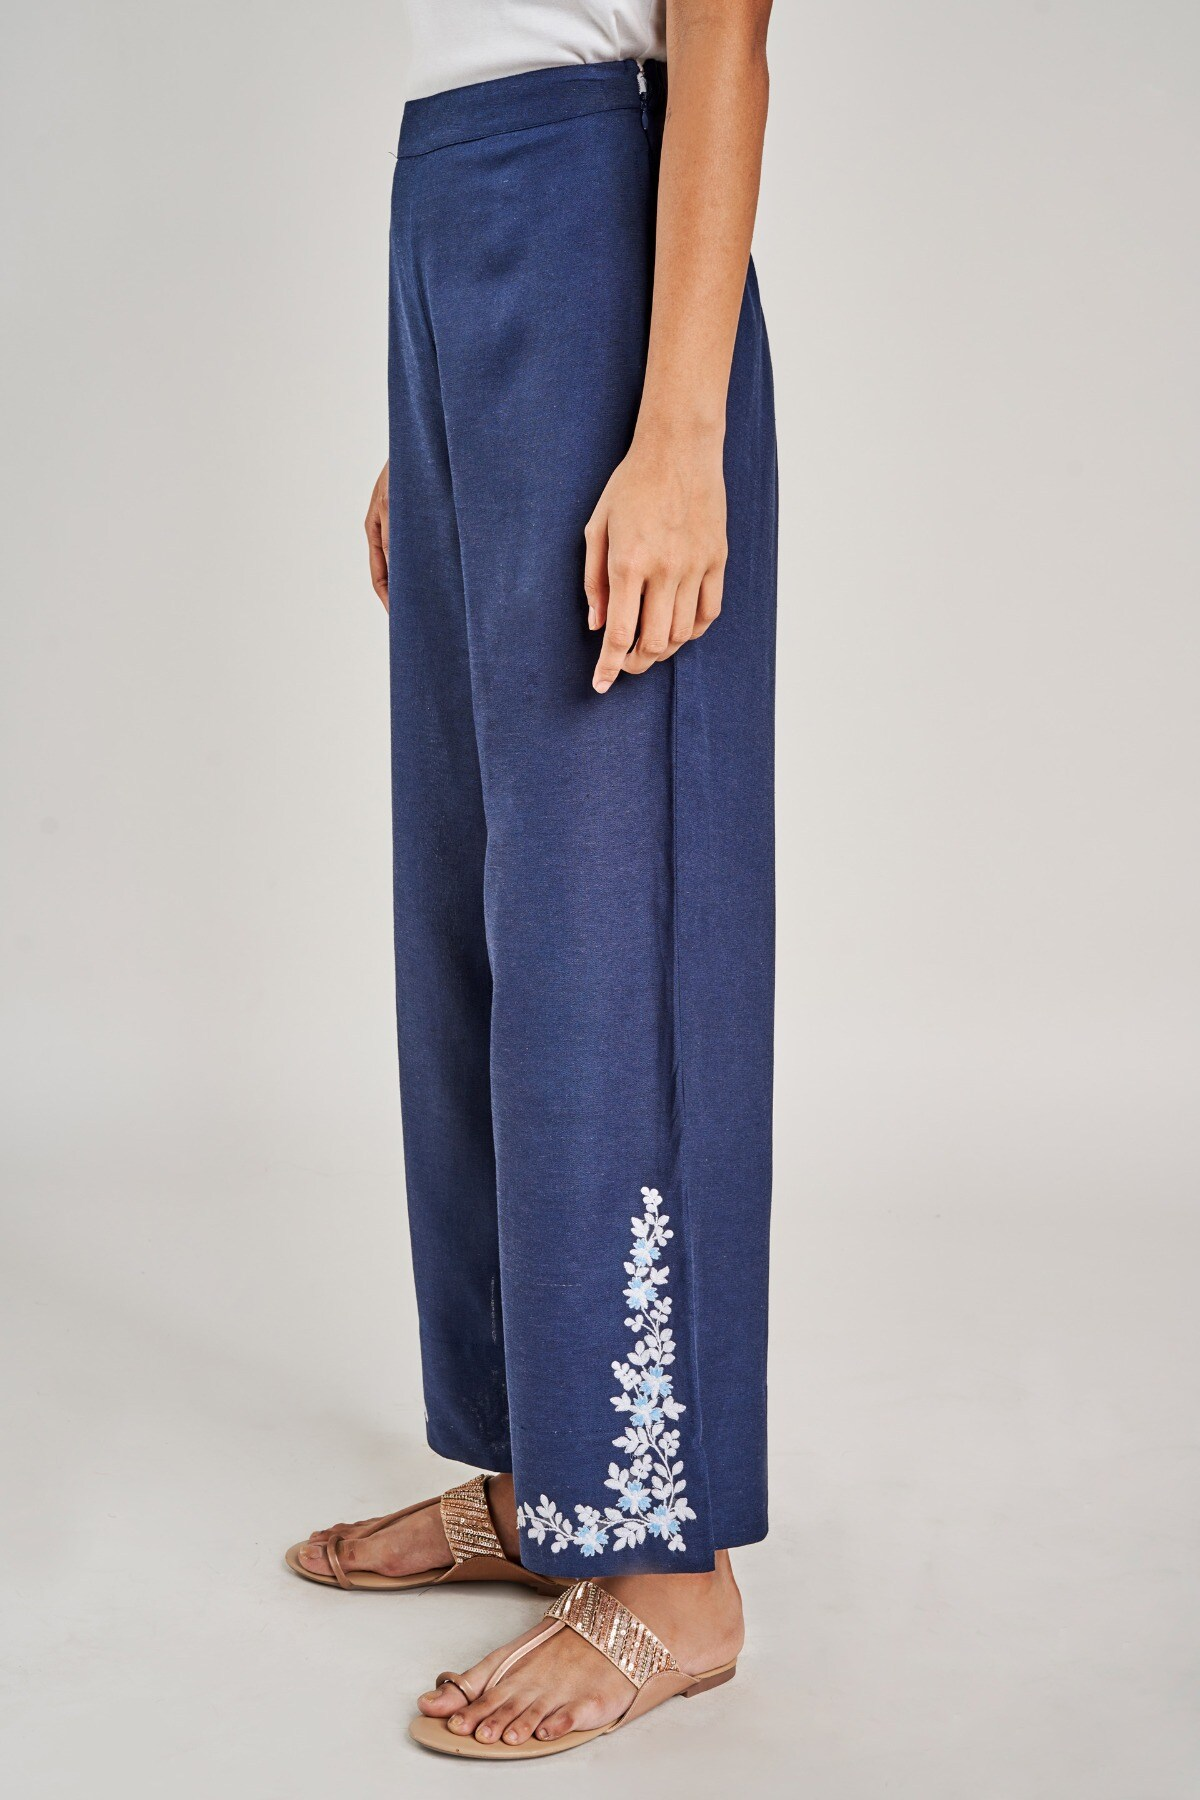 Global Desi | Dark Blue Solid Embroidered Bottom